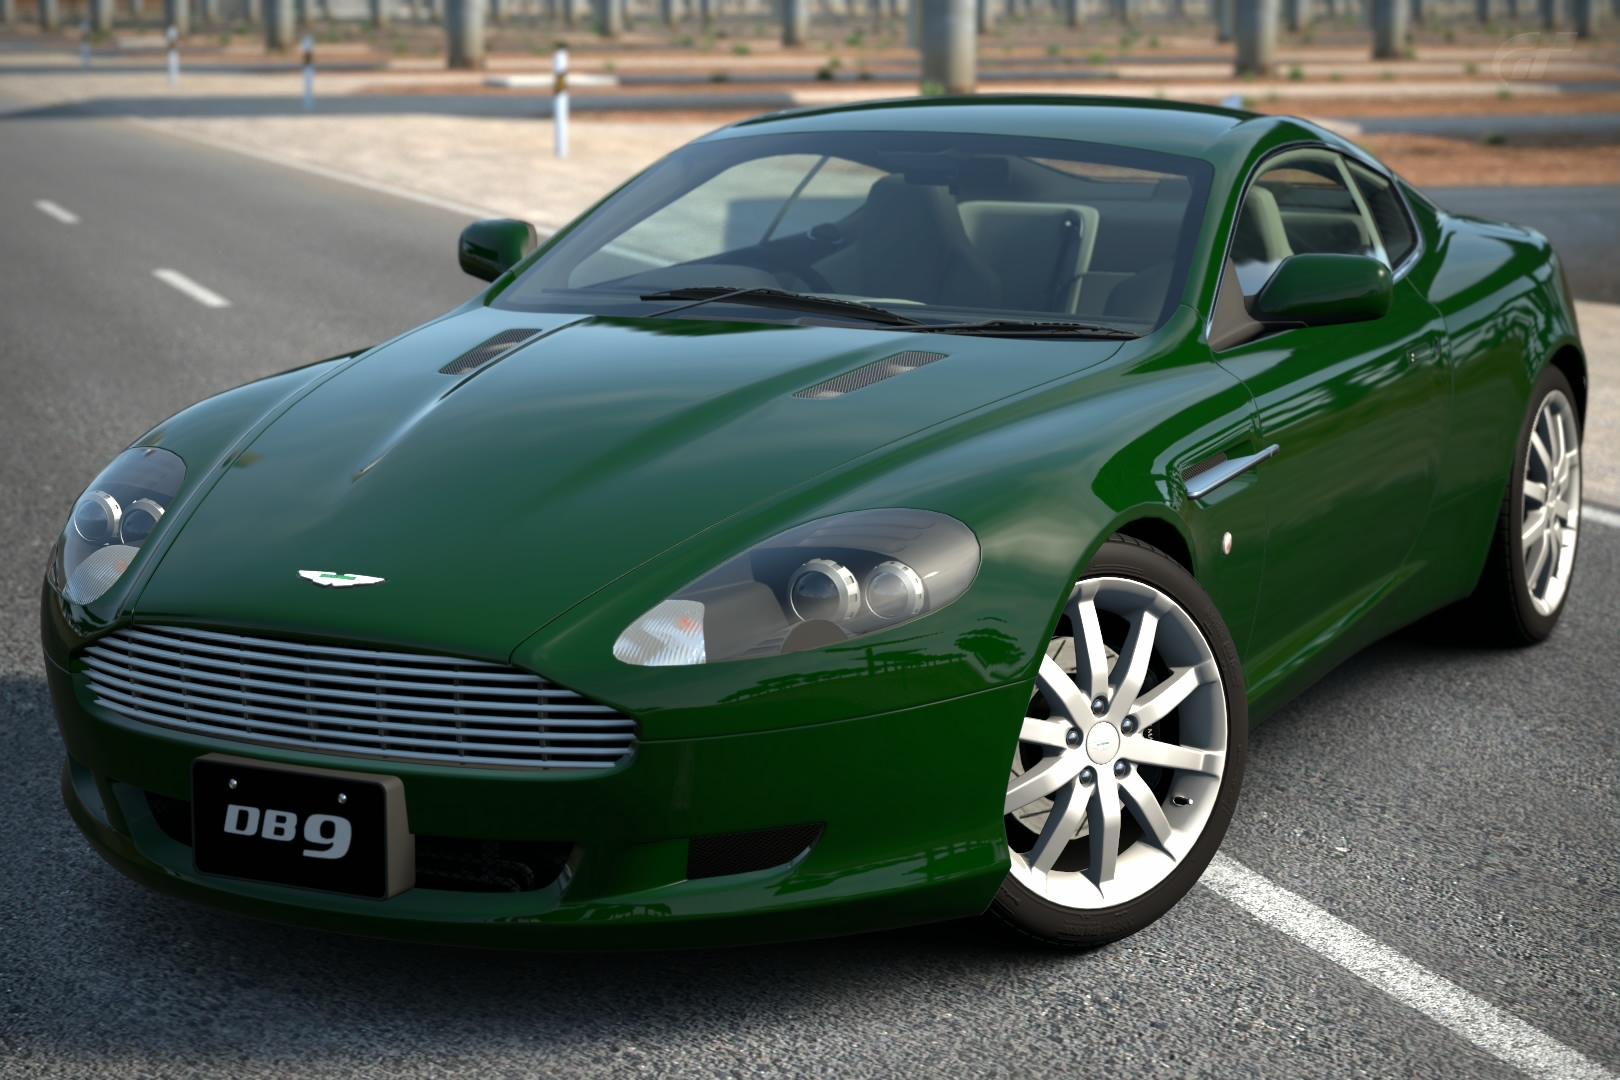 Aston Martin DB9 Coupe U002706